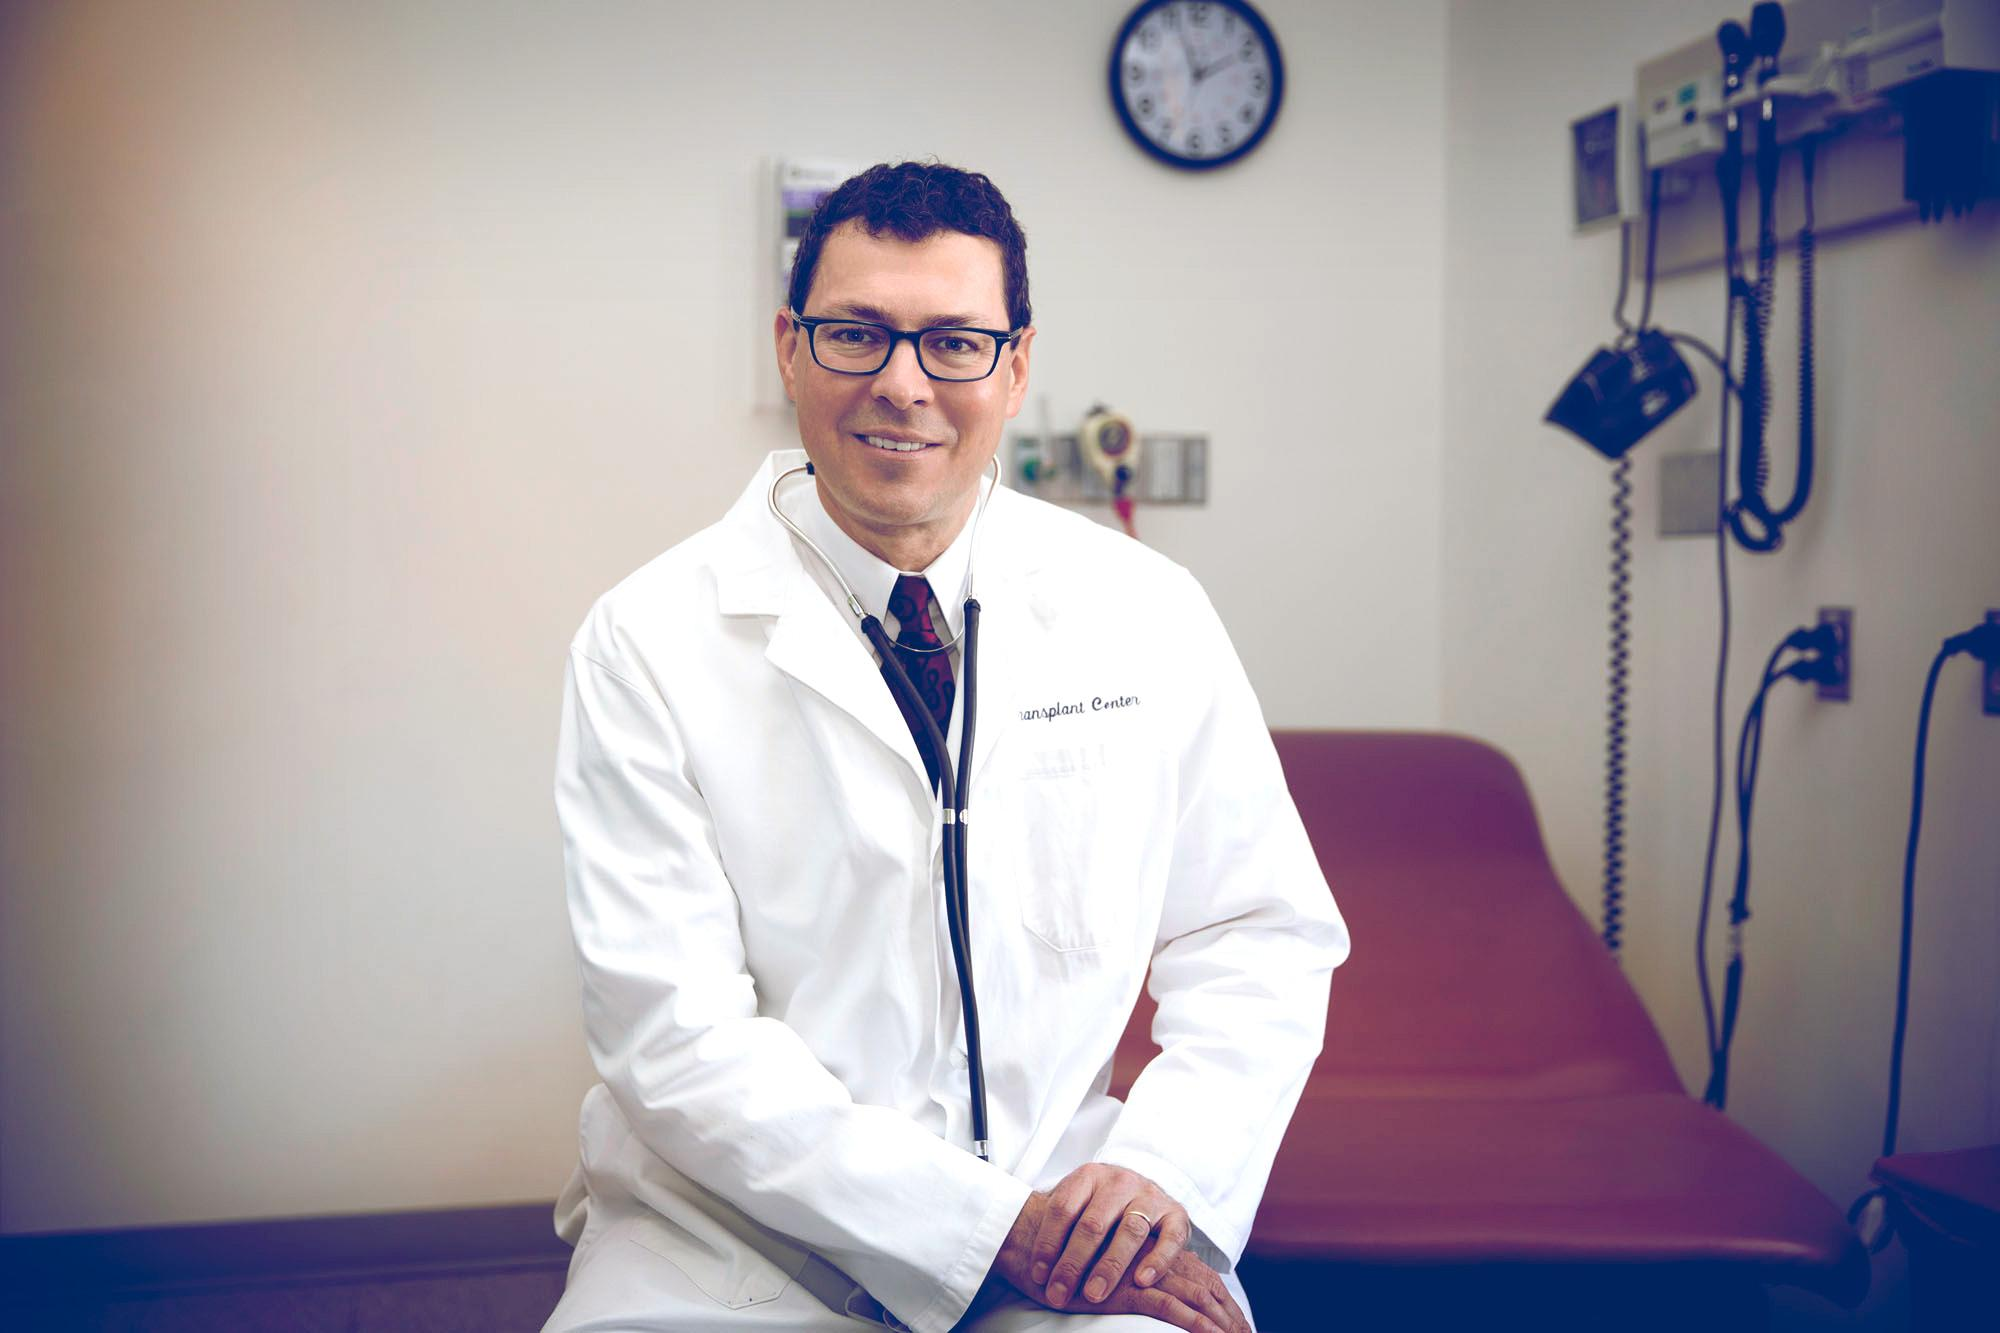 Dr. Jose Oberholzer is the incoming director of UVA's Charles O. Strickler Transplant Center.